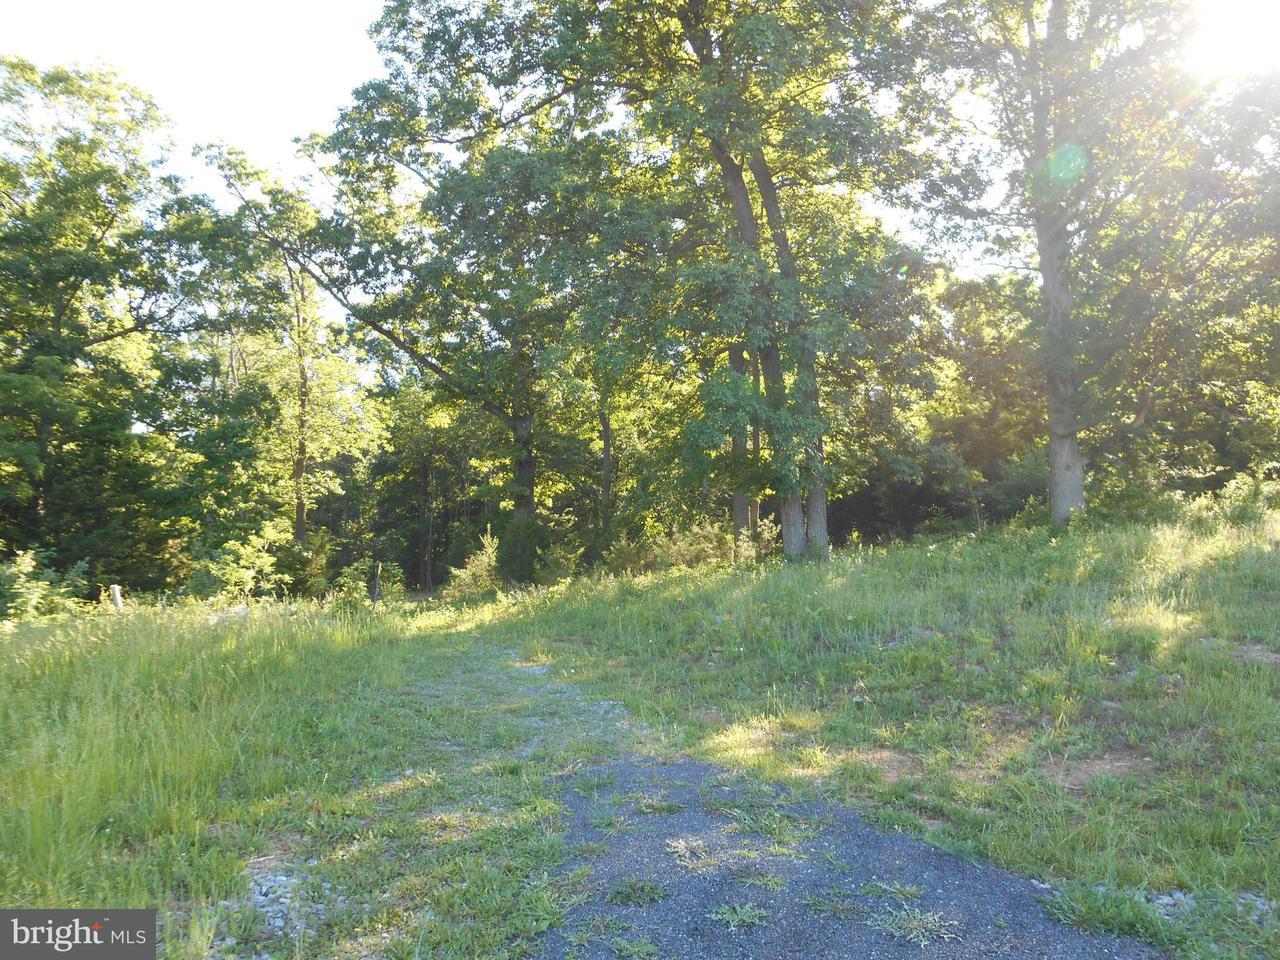 Land for Sale at Lot 33 Savannah Dr Strasburg, Virginia 22657 United States